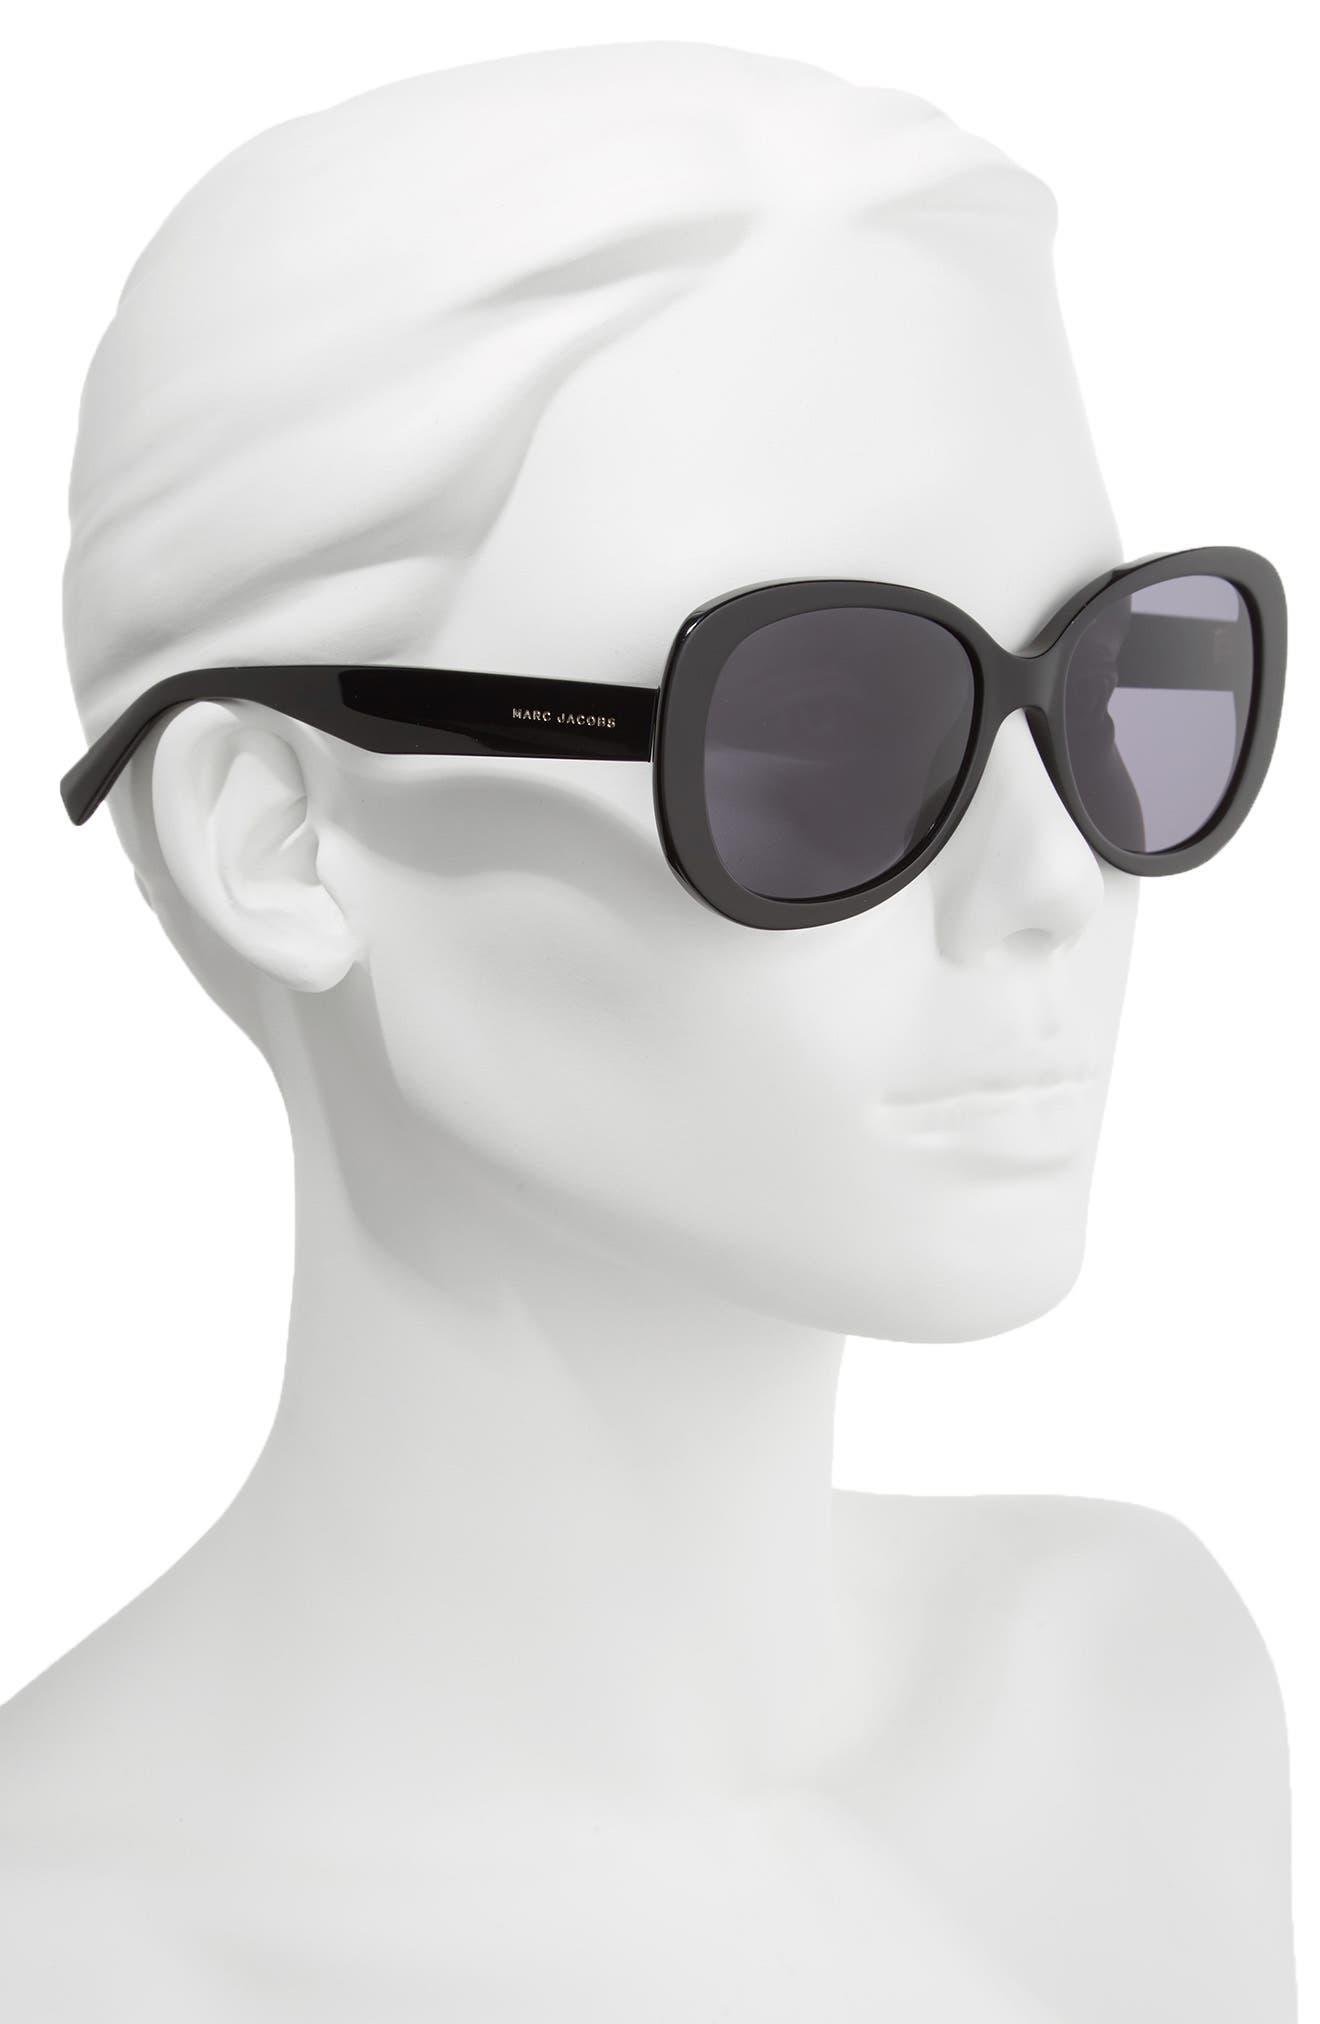 dcb40450d1dba MARC JACOBS Sunglasses for Women